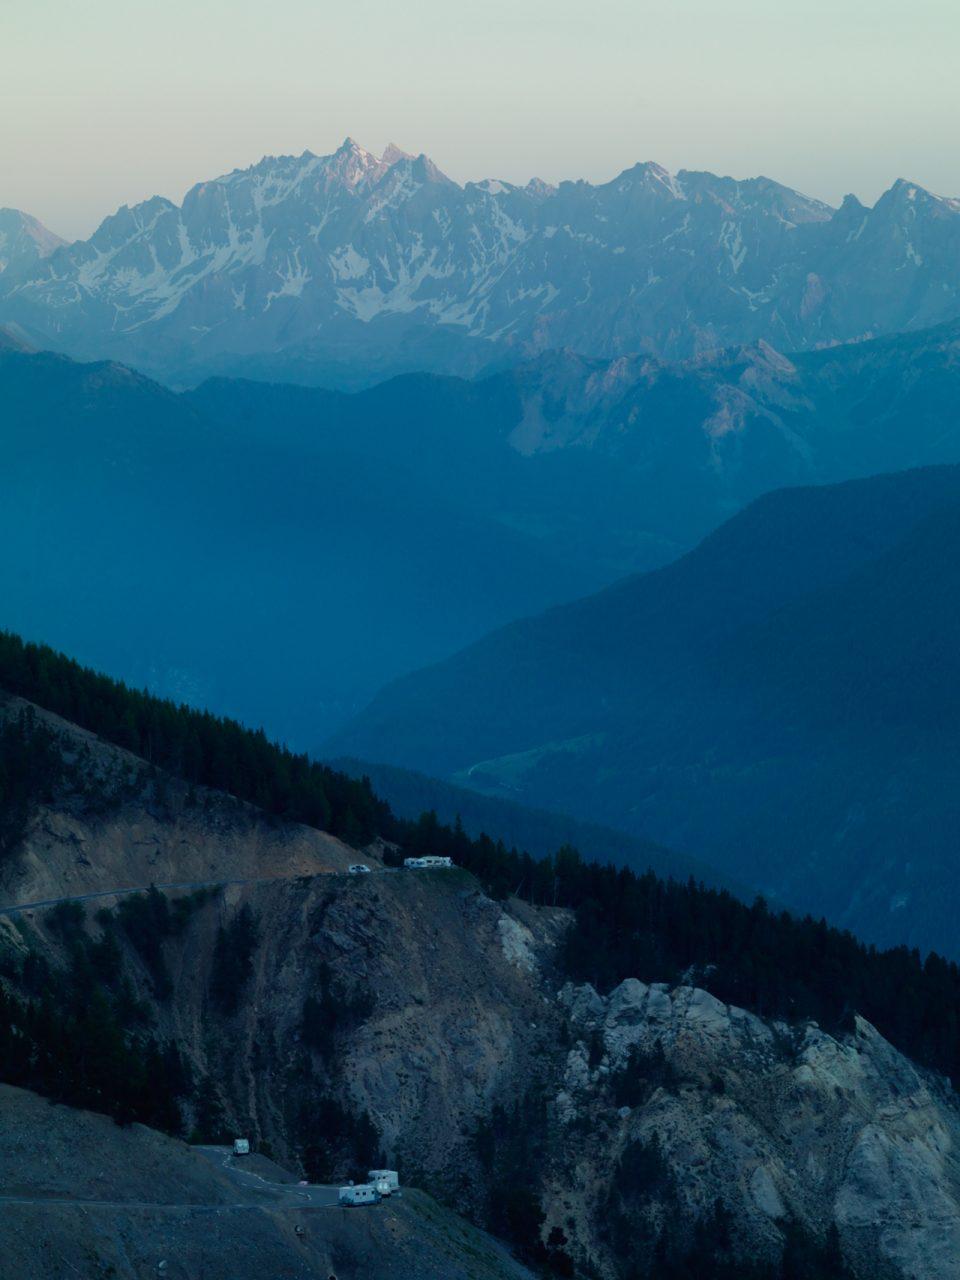 Mountains_06-960x1280.jpg